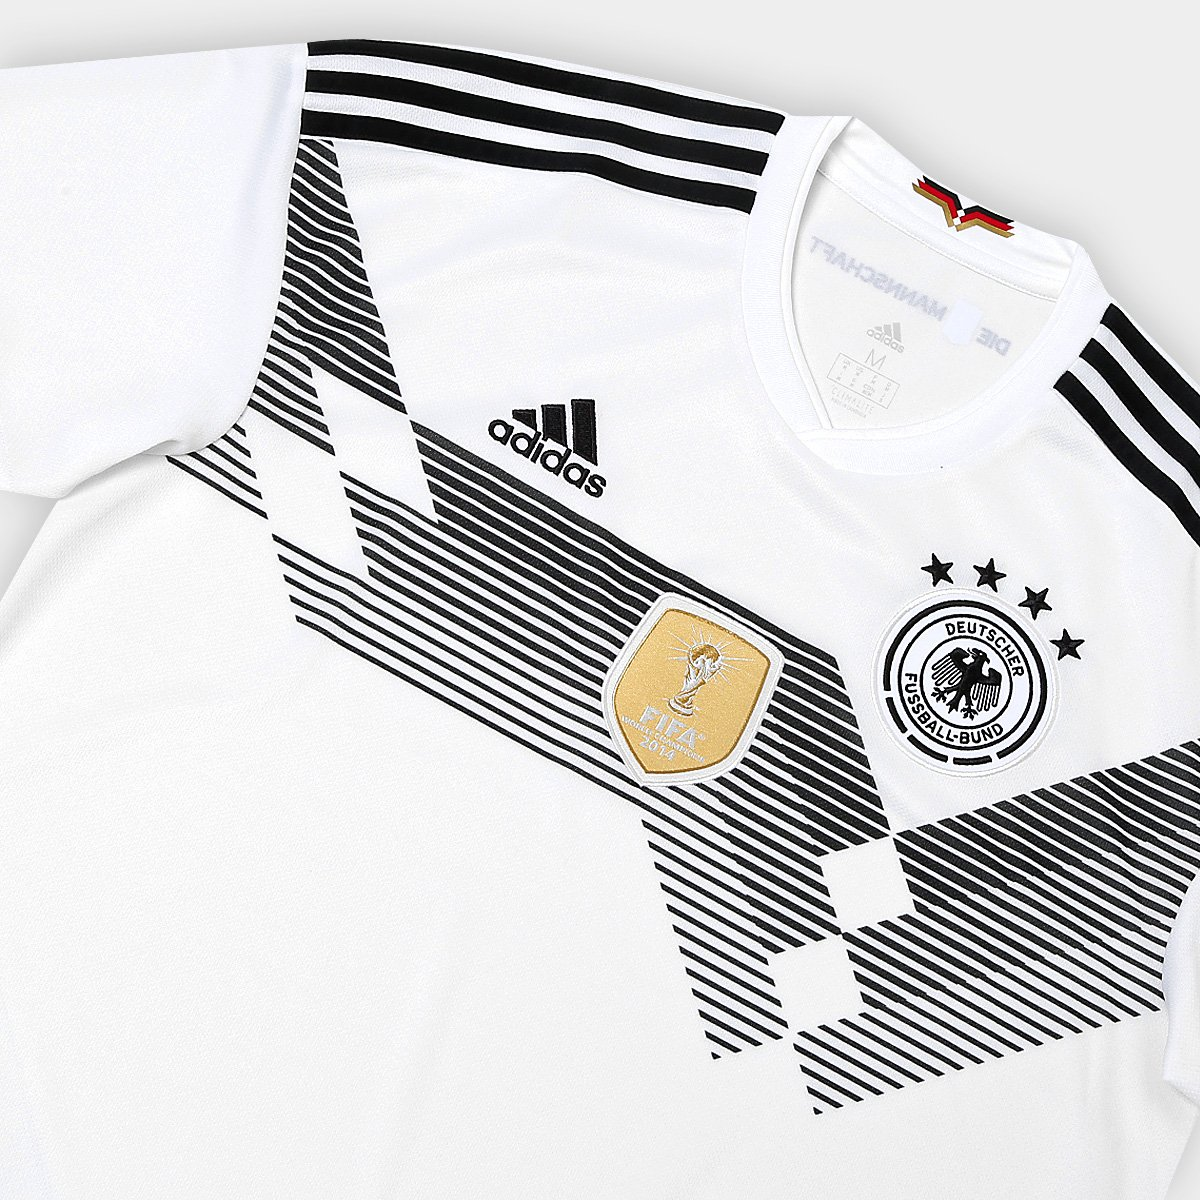 ... Camisa Seleção Alemanha Home 2018 n° 5 Hummels - Torcedor Adidas  Masculina eb8198f177018